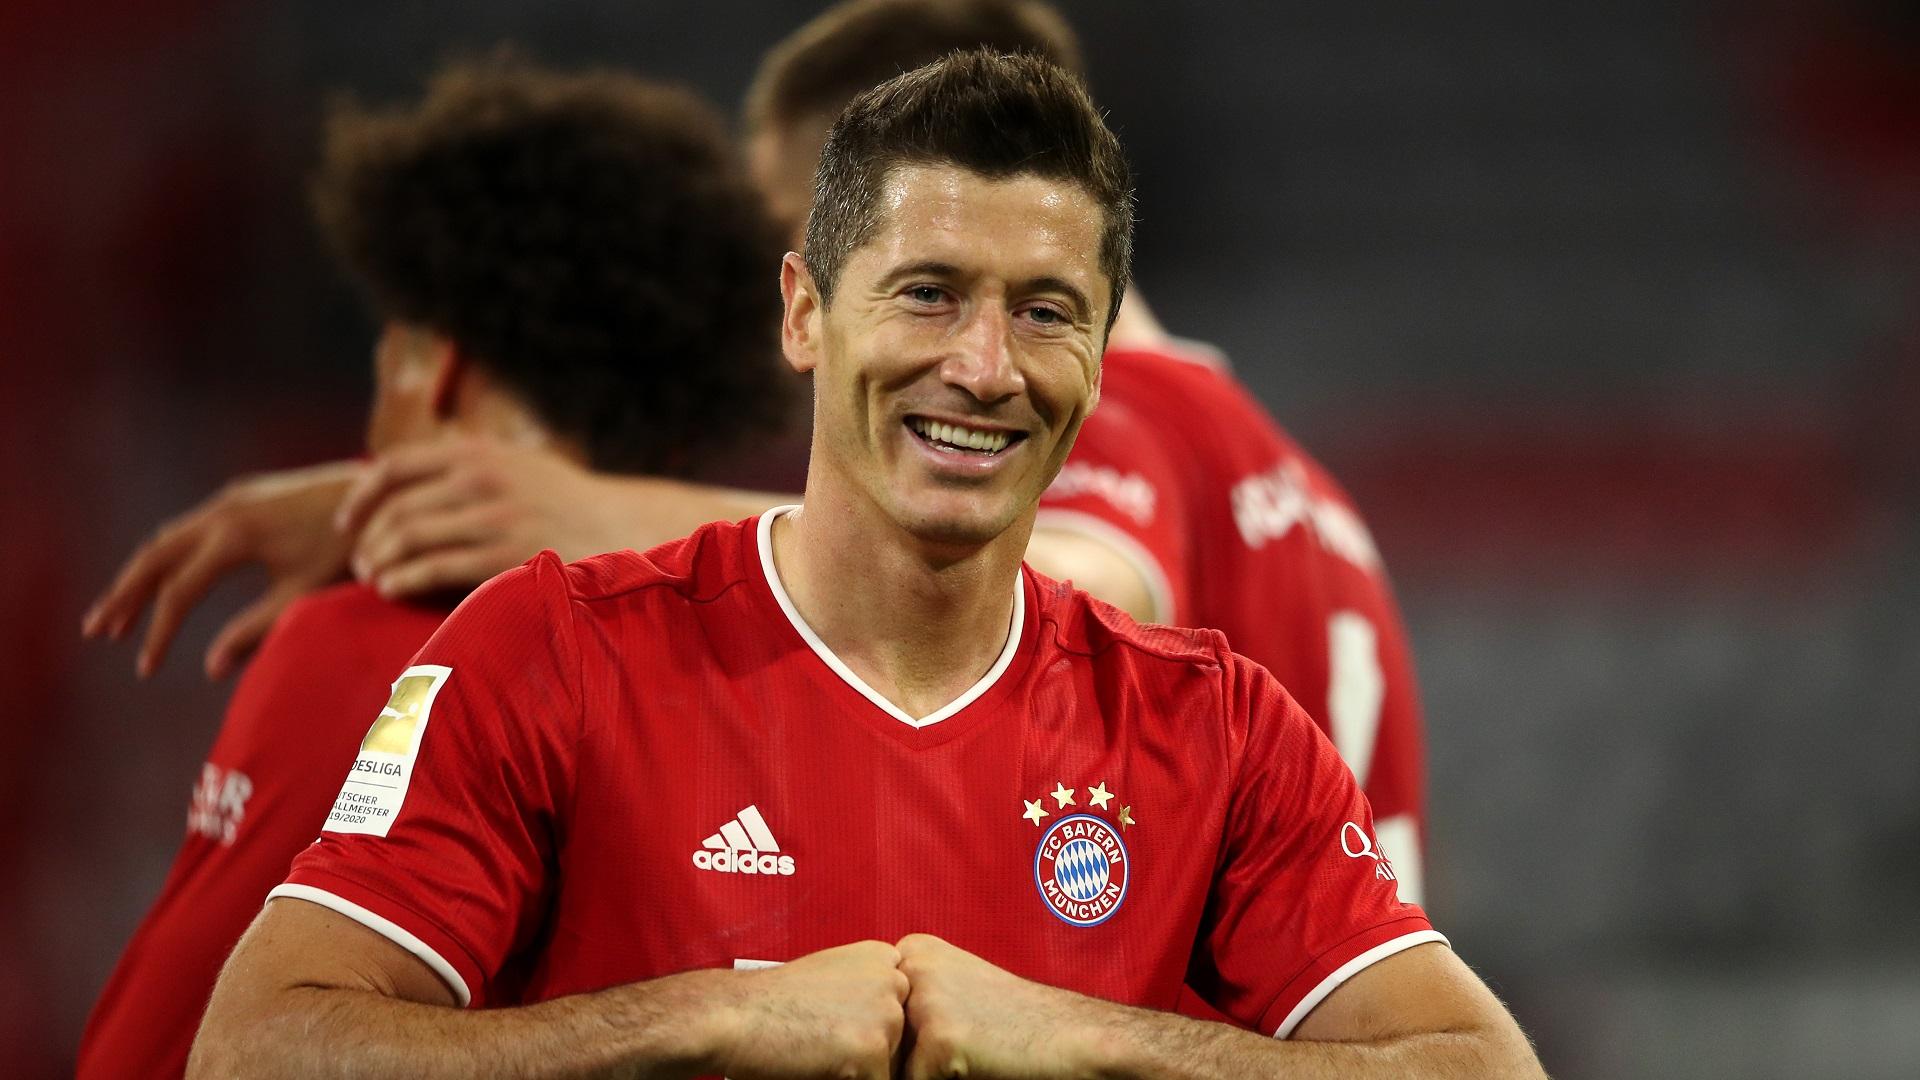 Lewandowski to be named European Footballer of the Year as Bayern star beats De Bruyne and Neuer to top award